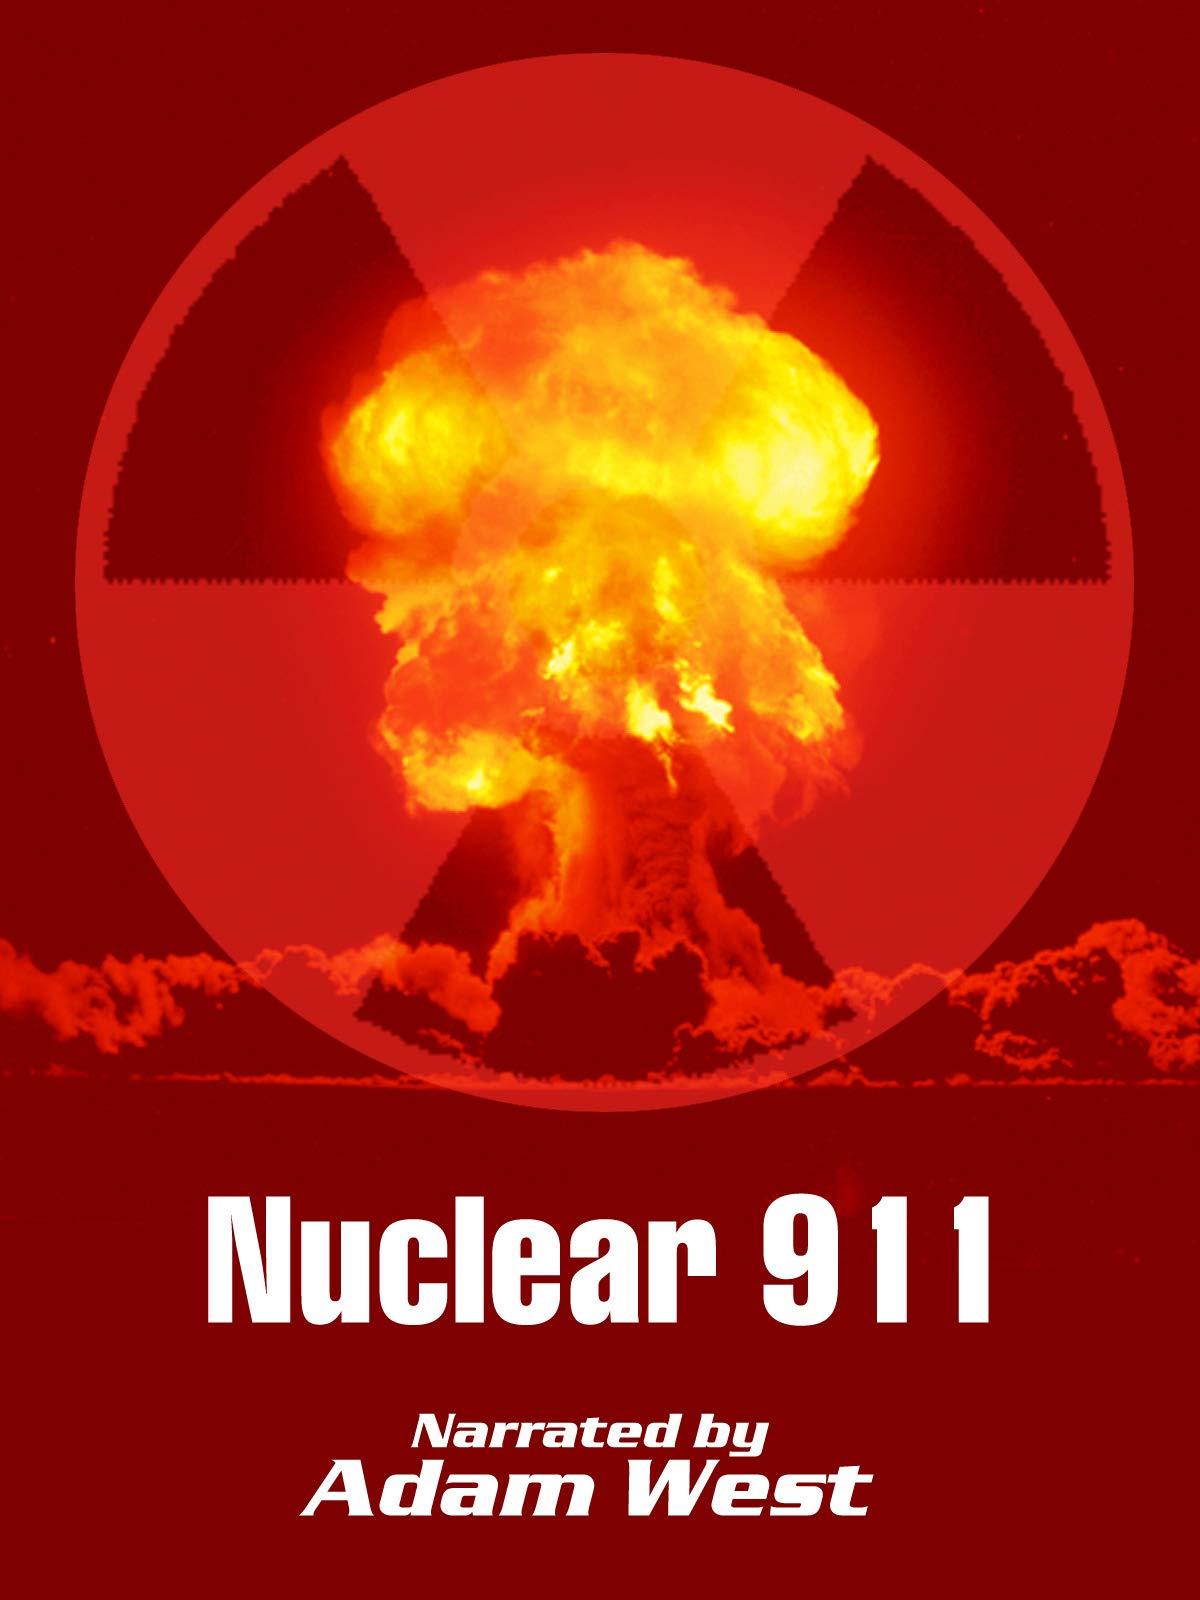 Nuclear 911 - Broken Arrows & Incidents